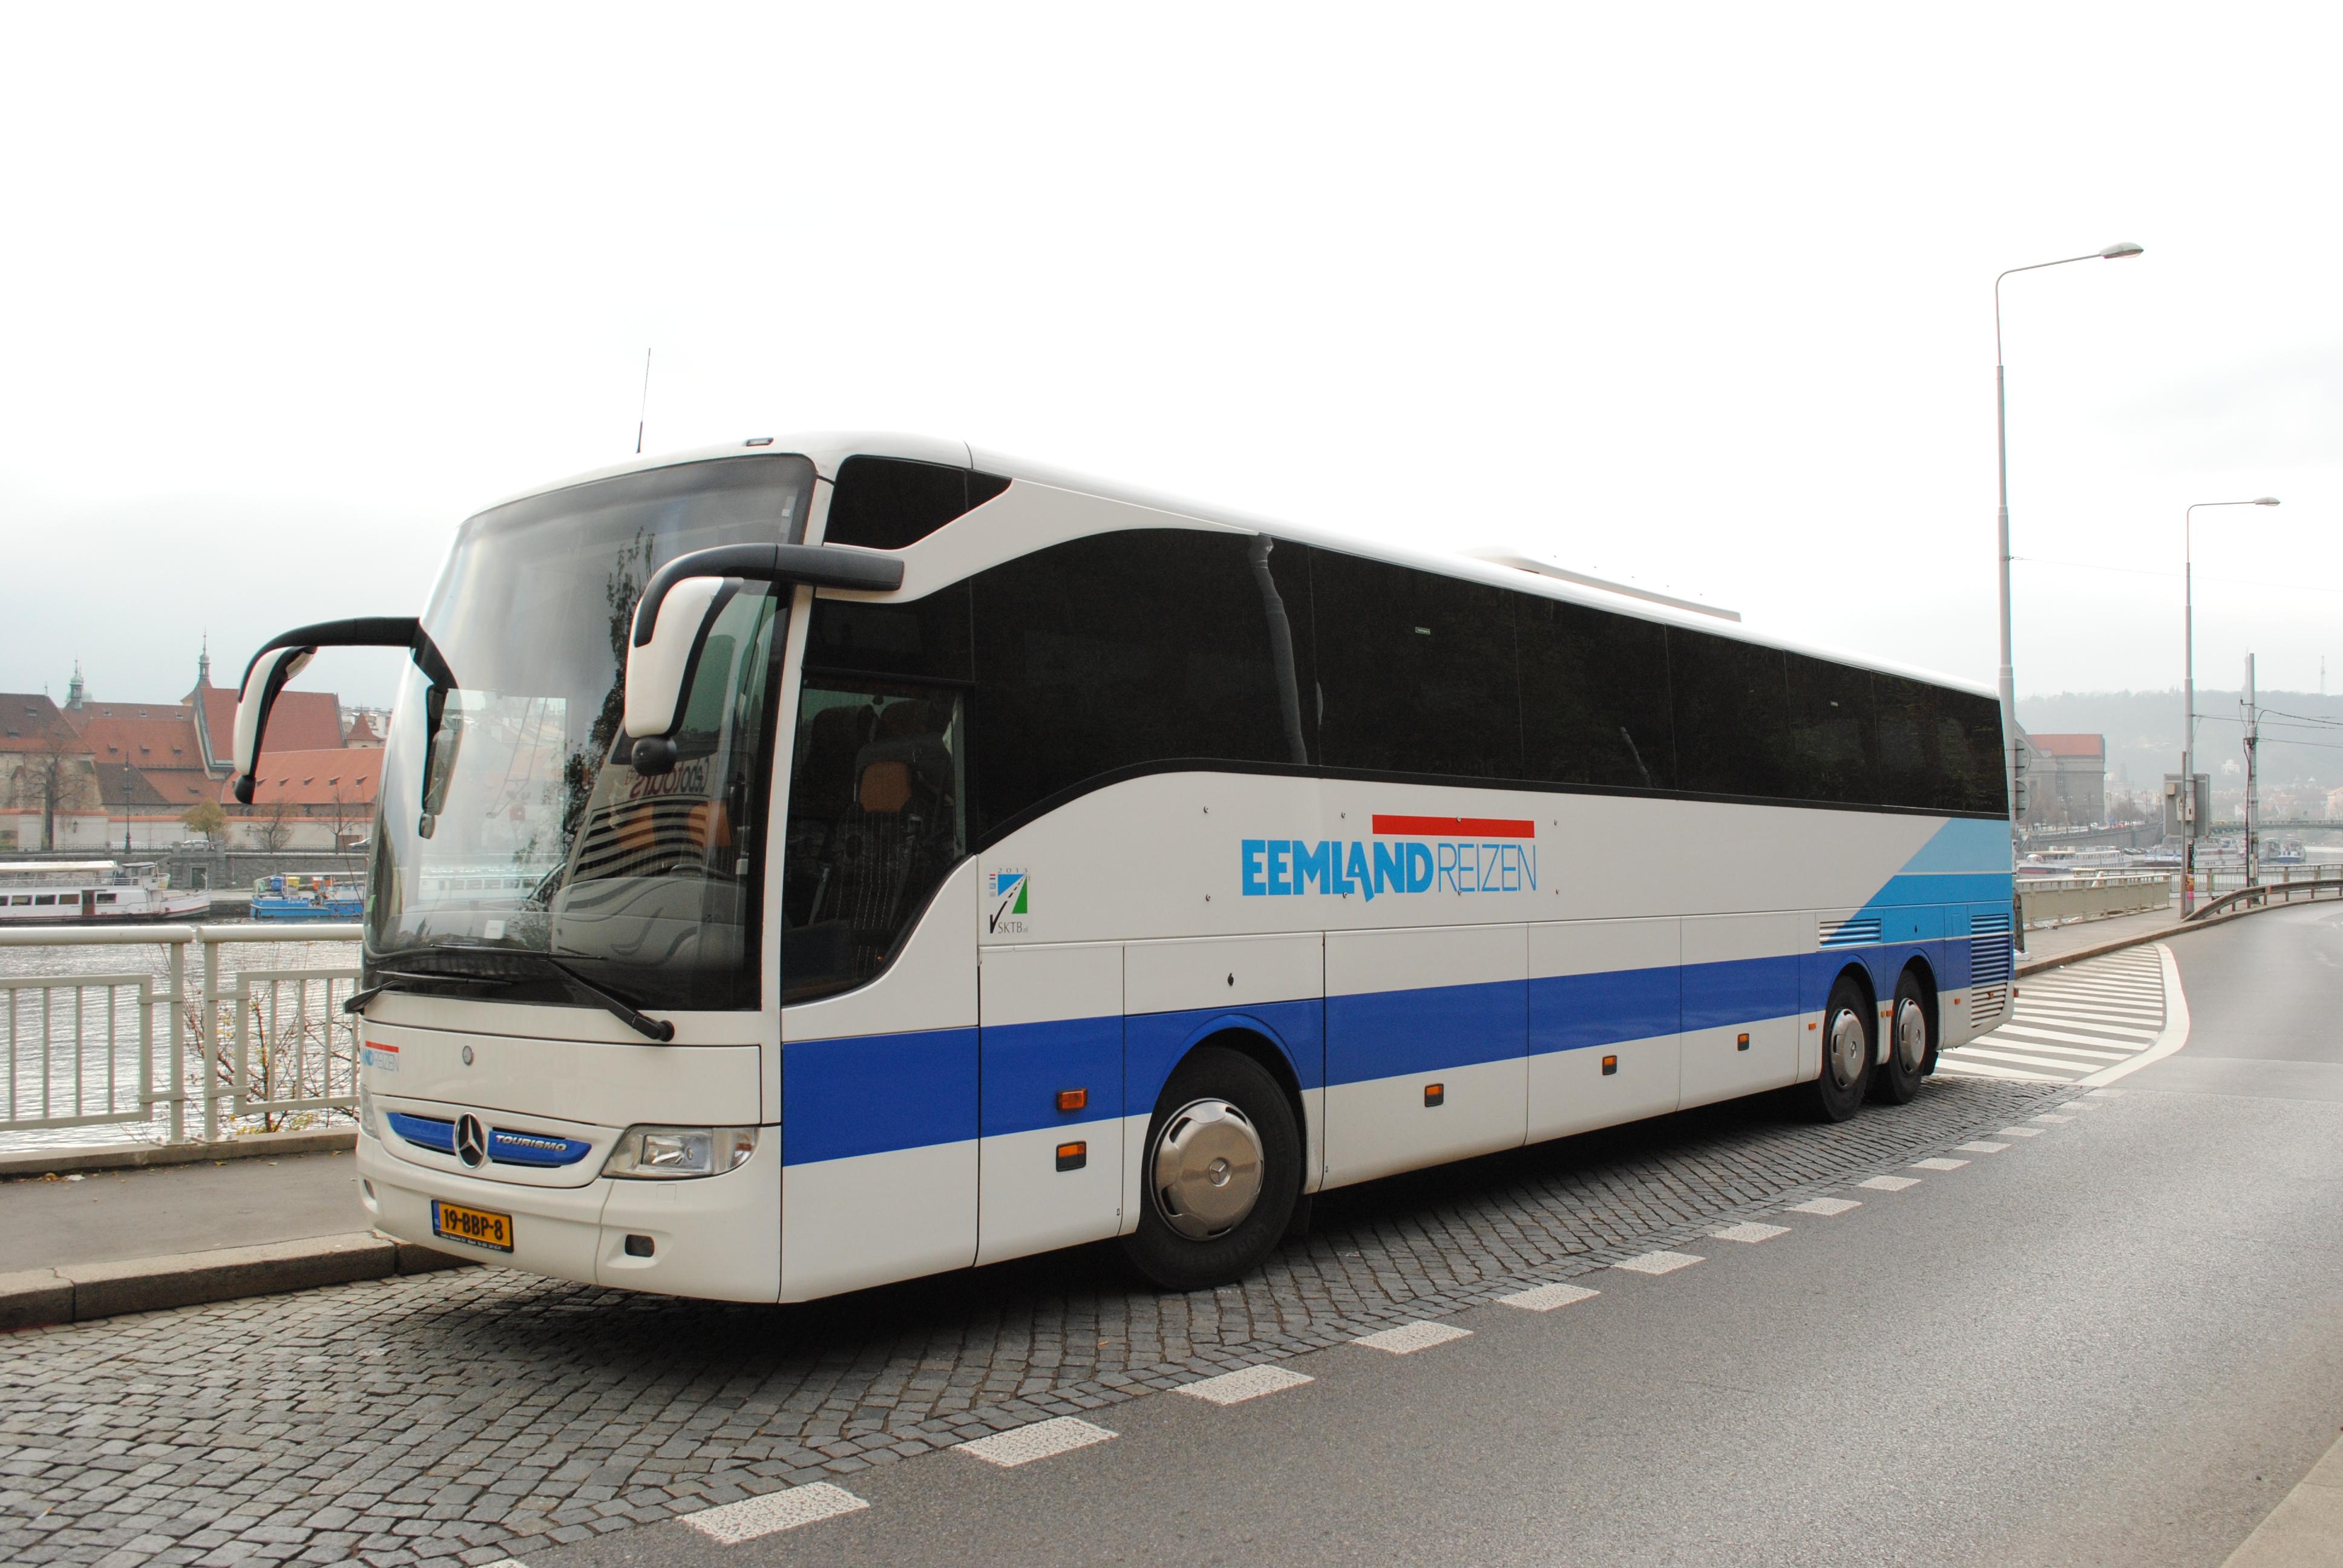 File Mercedes Benz Tourismo Eemland Reizen Holland Wikimedia